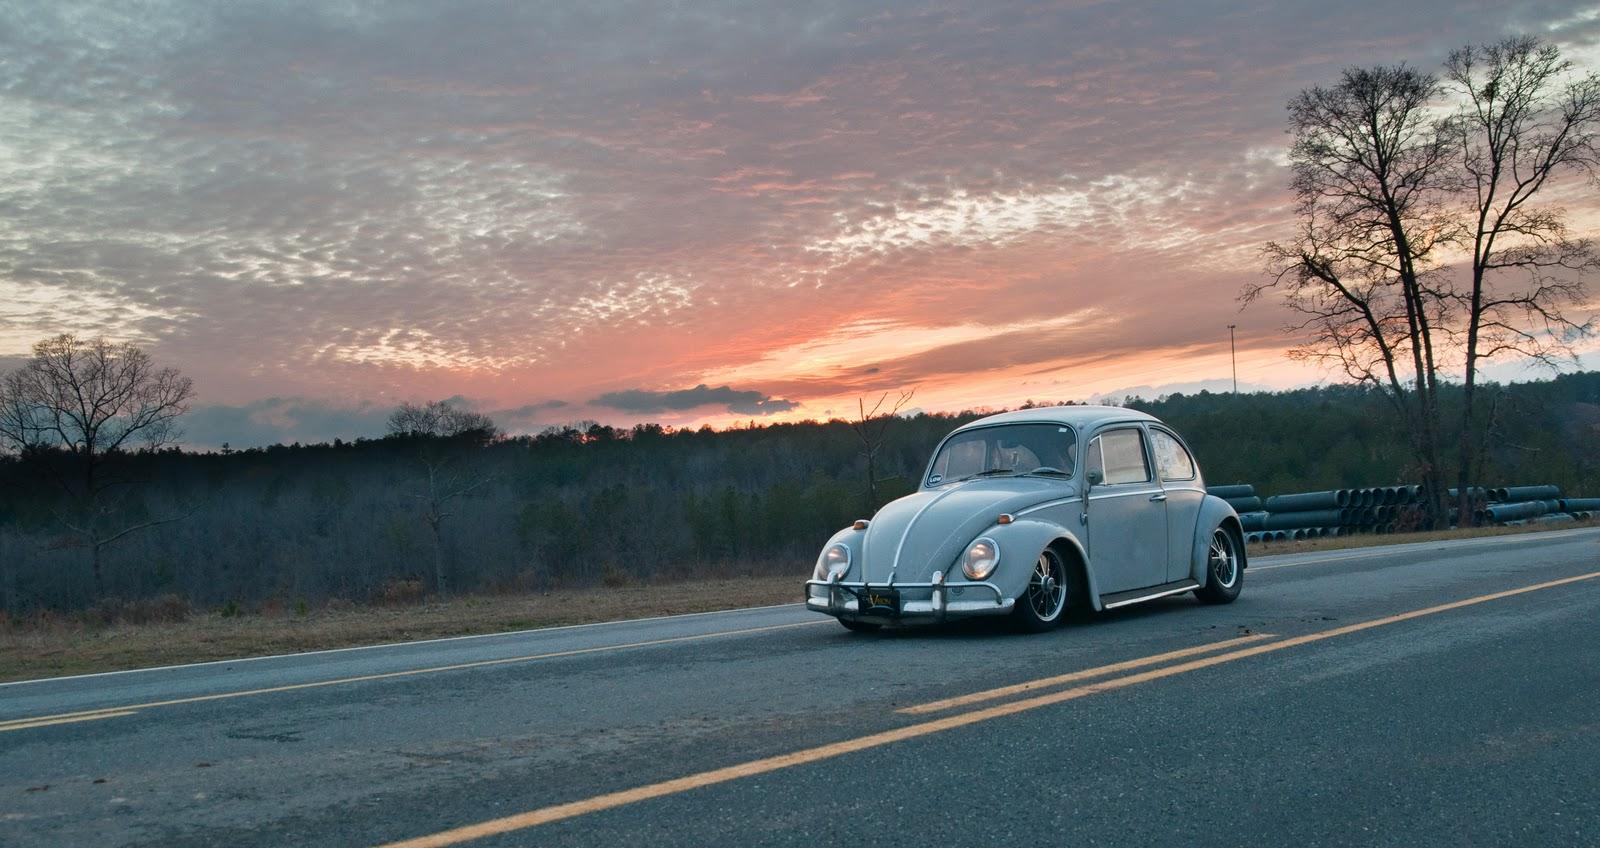 Otis - my '65 Beetle DSC_0058